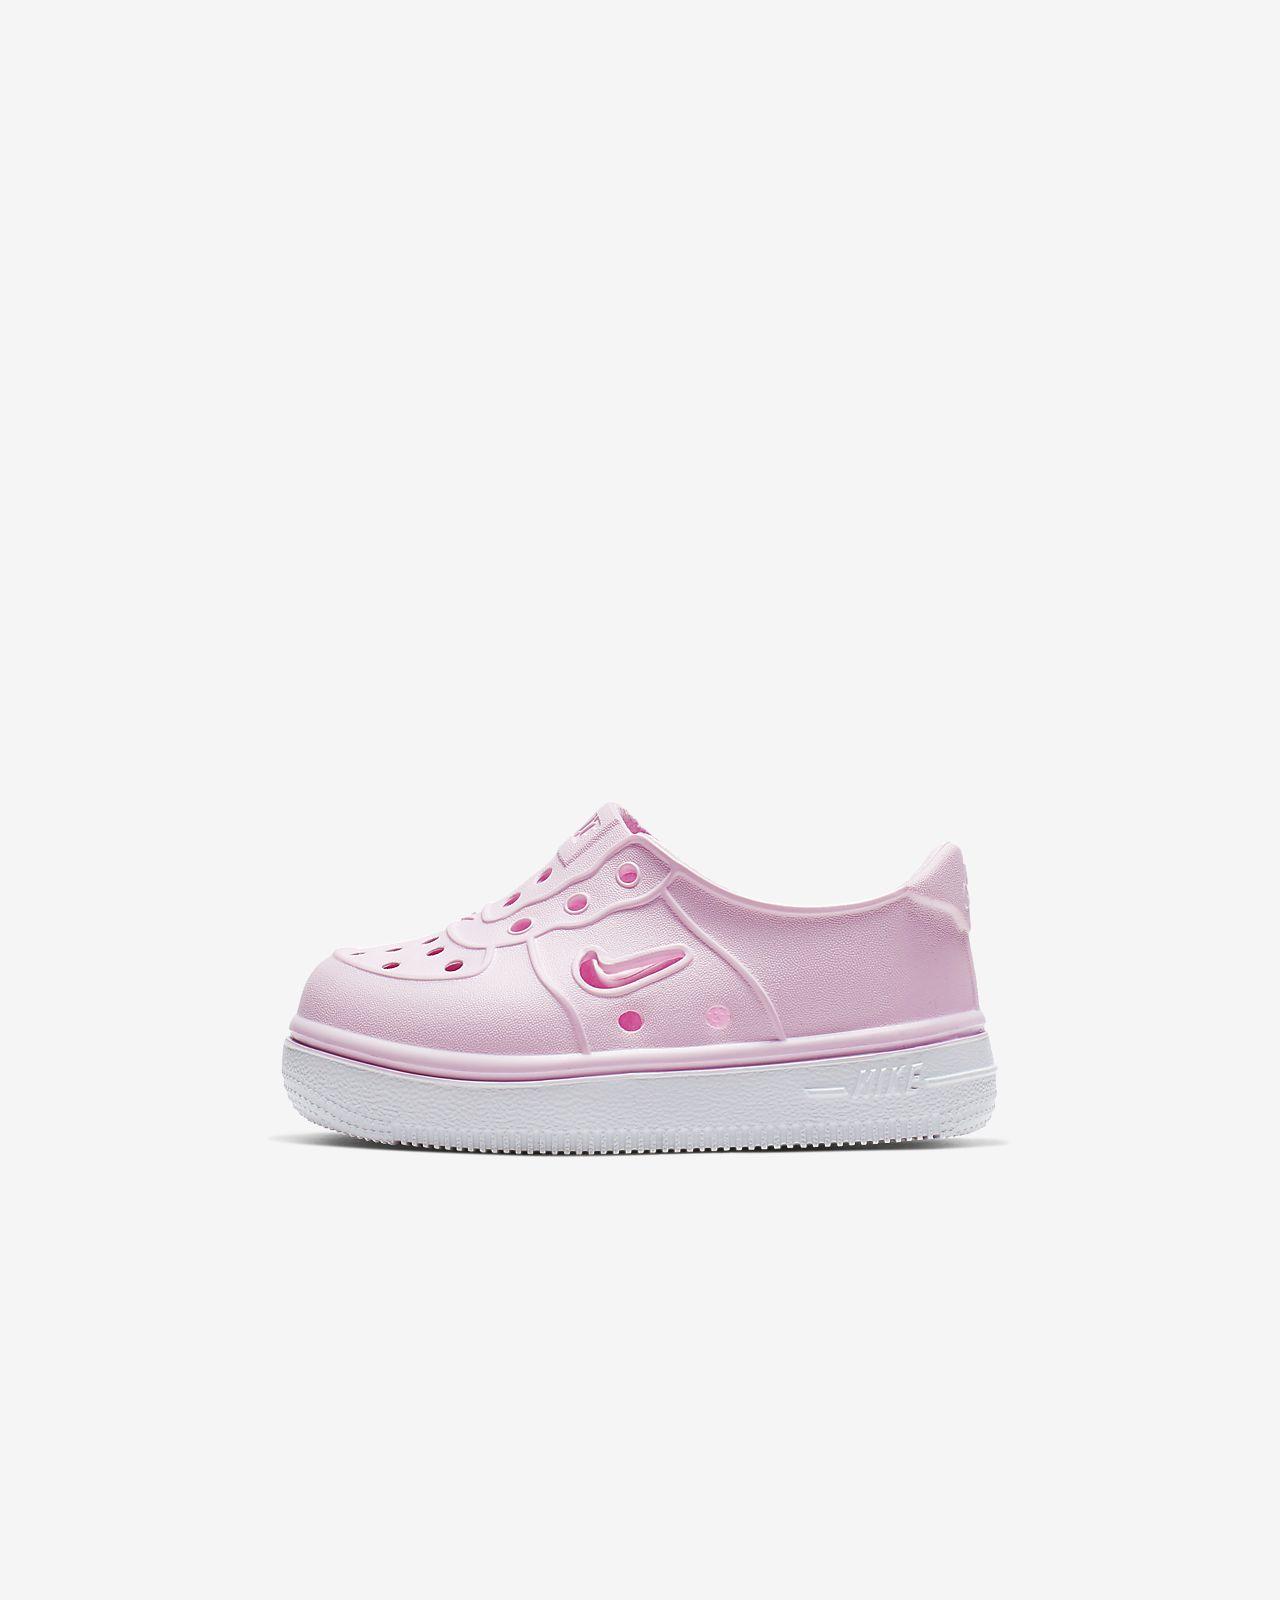 Nike Foam Force 1 Baby & Toddler Shoe